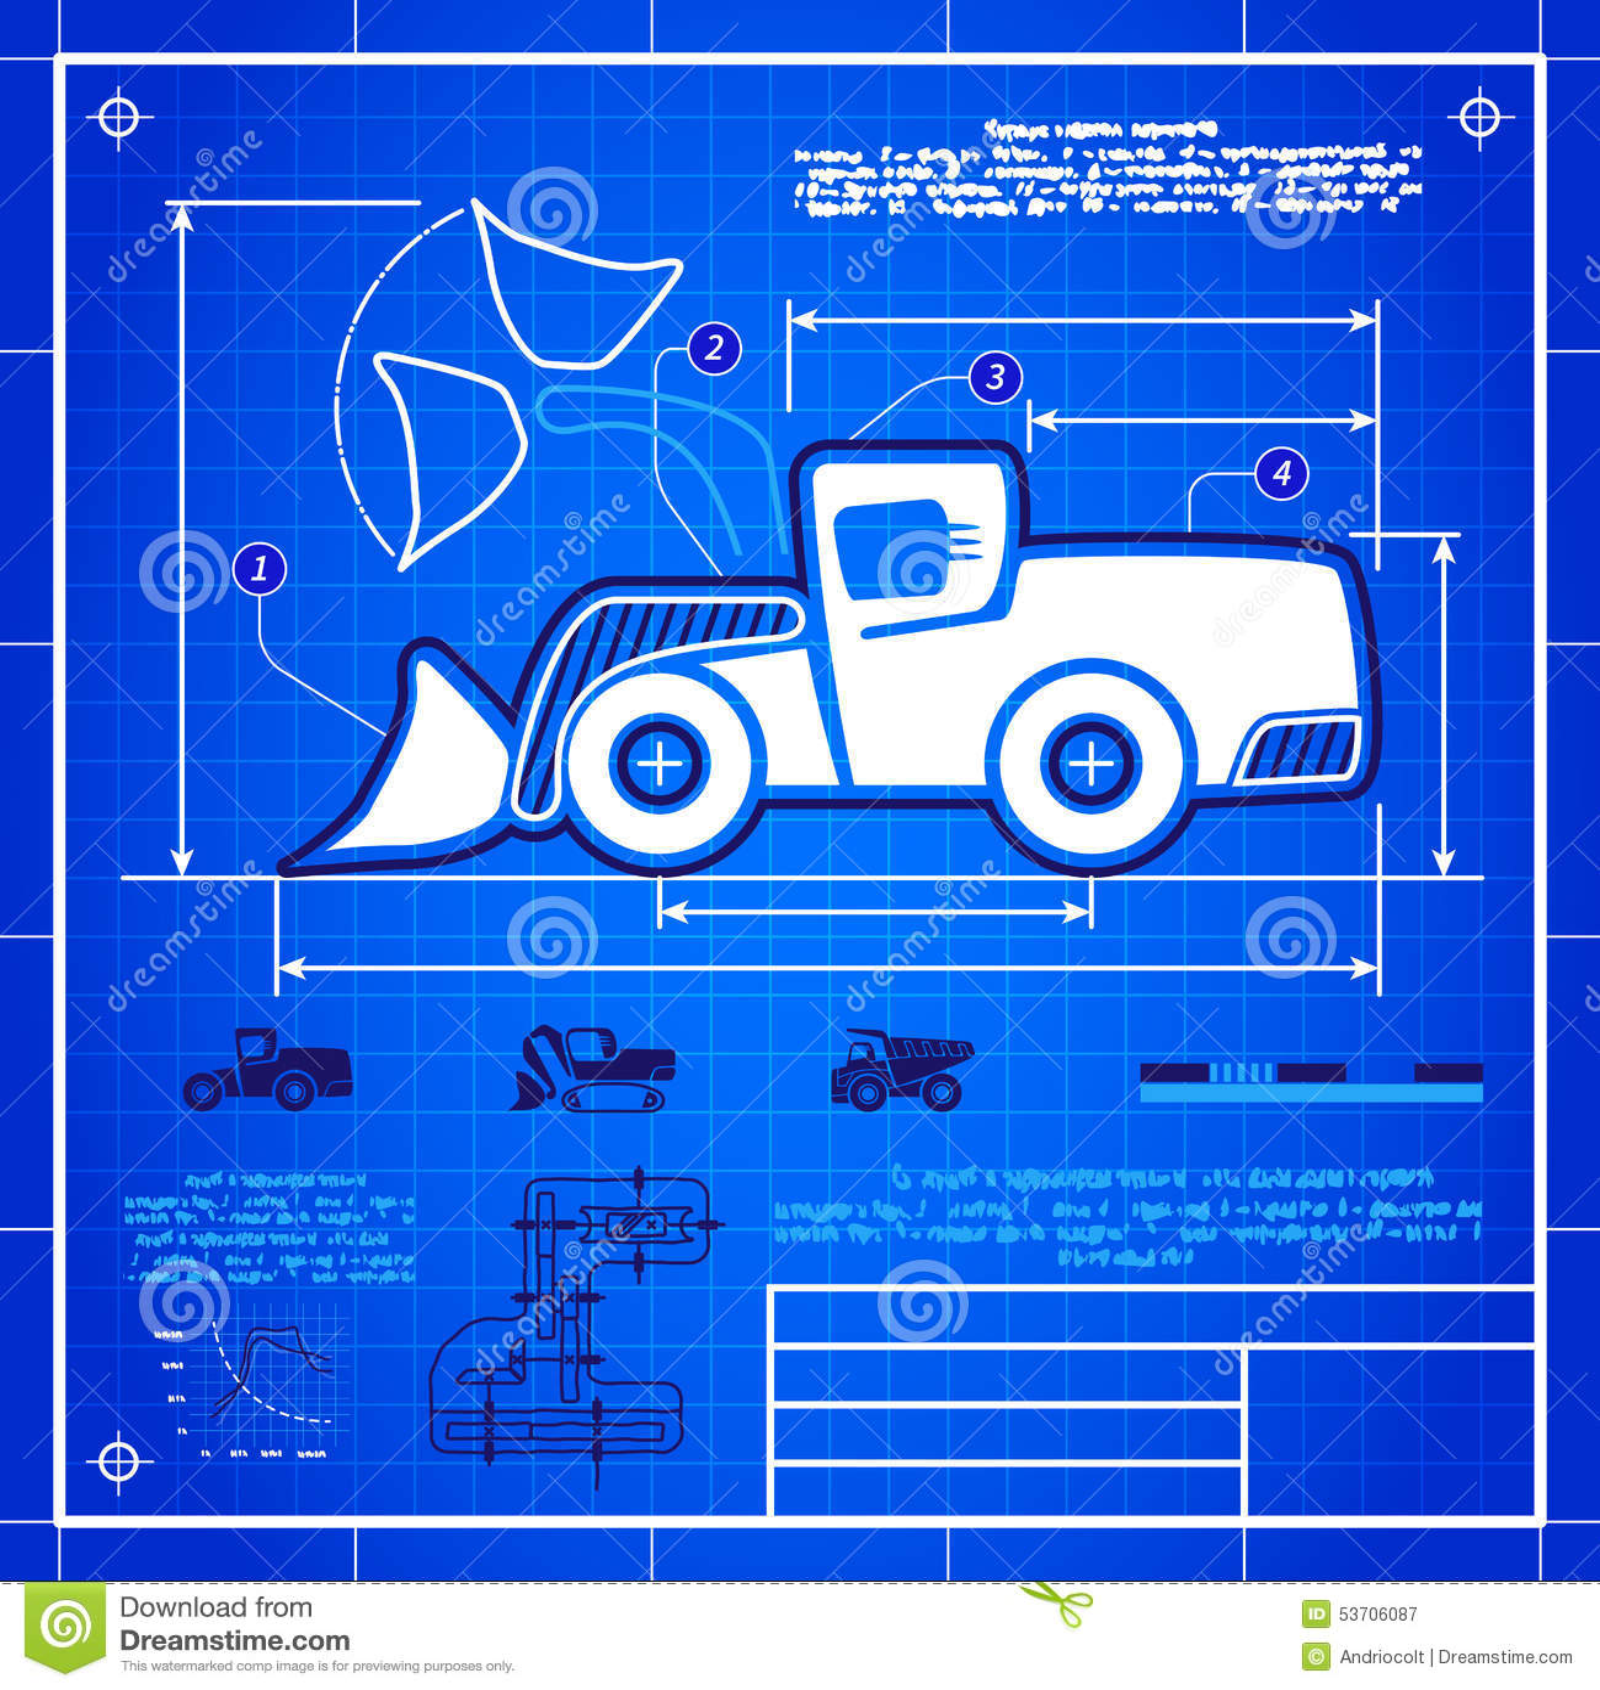 Beautiful free blueprint program online ideas electrical and excellent free blueprint program online pictures inspiration malvernweather Gallery